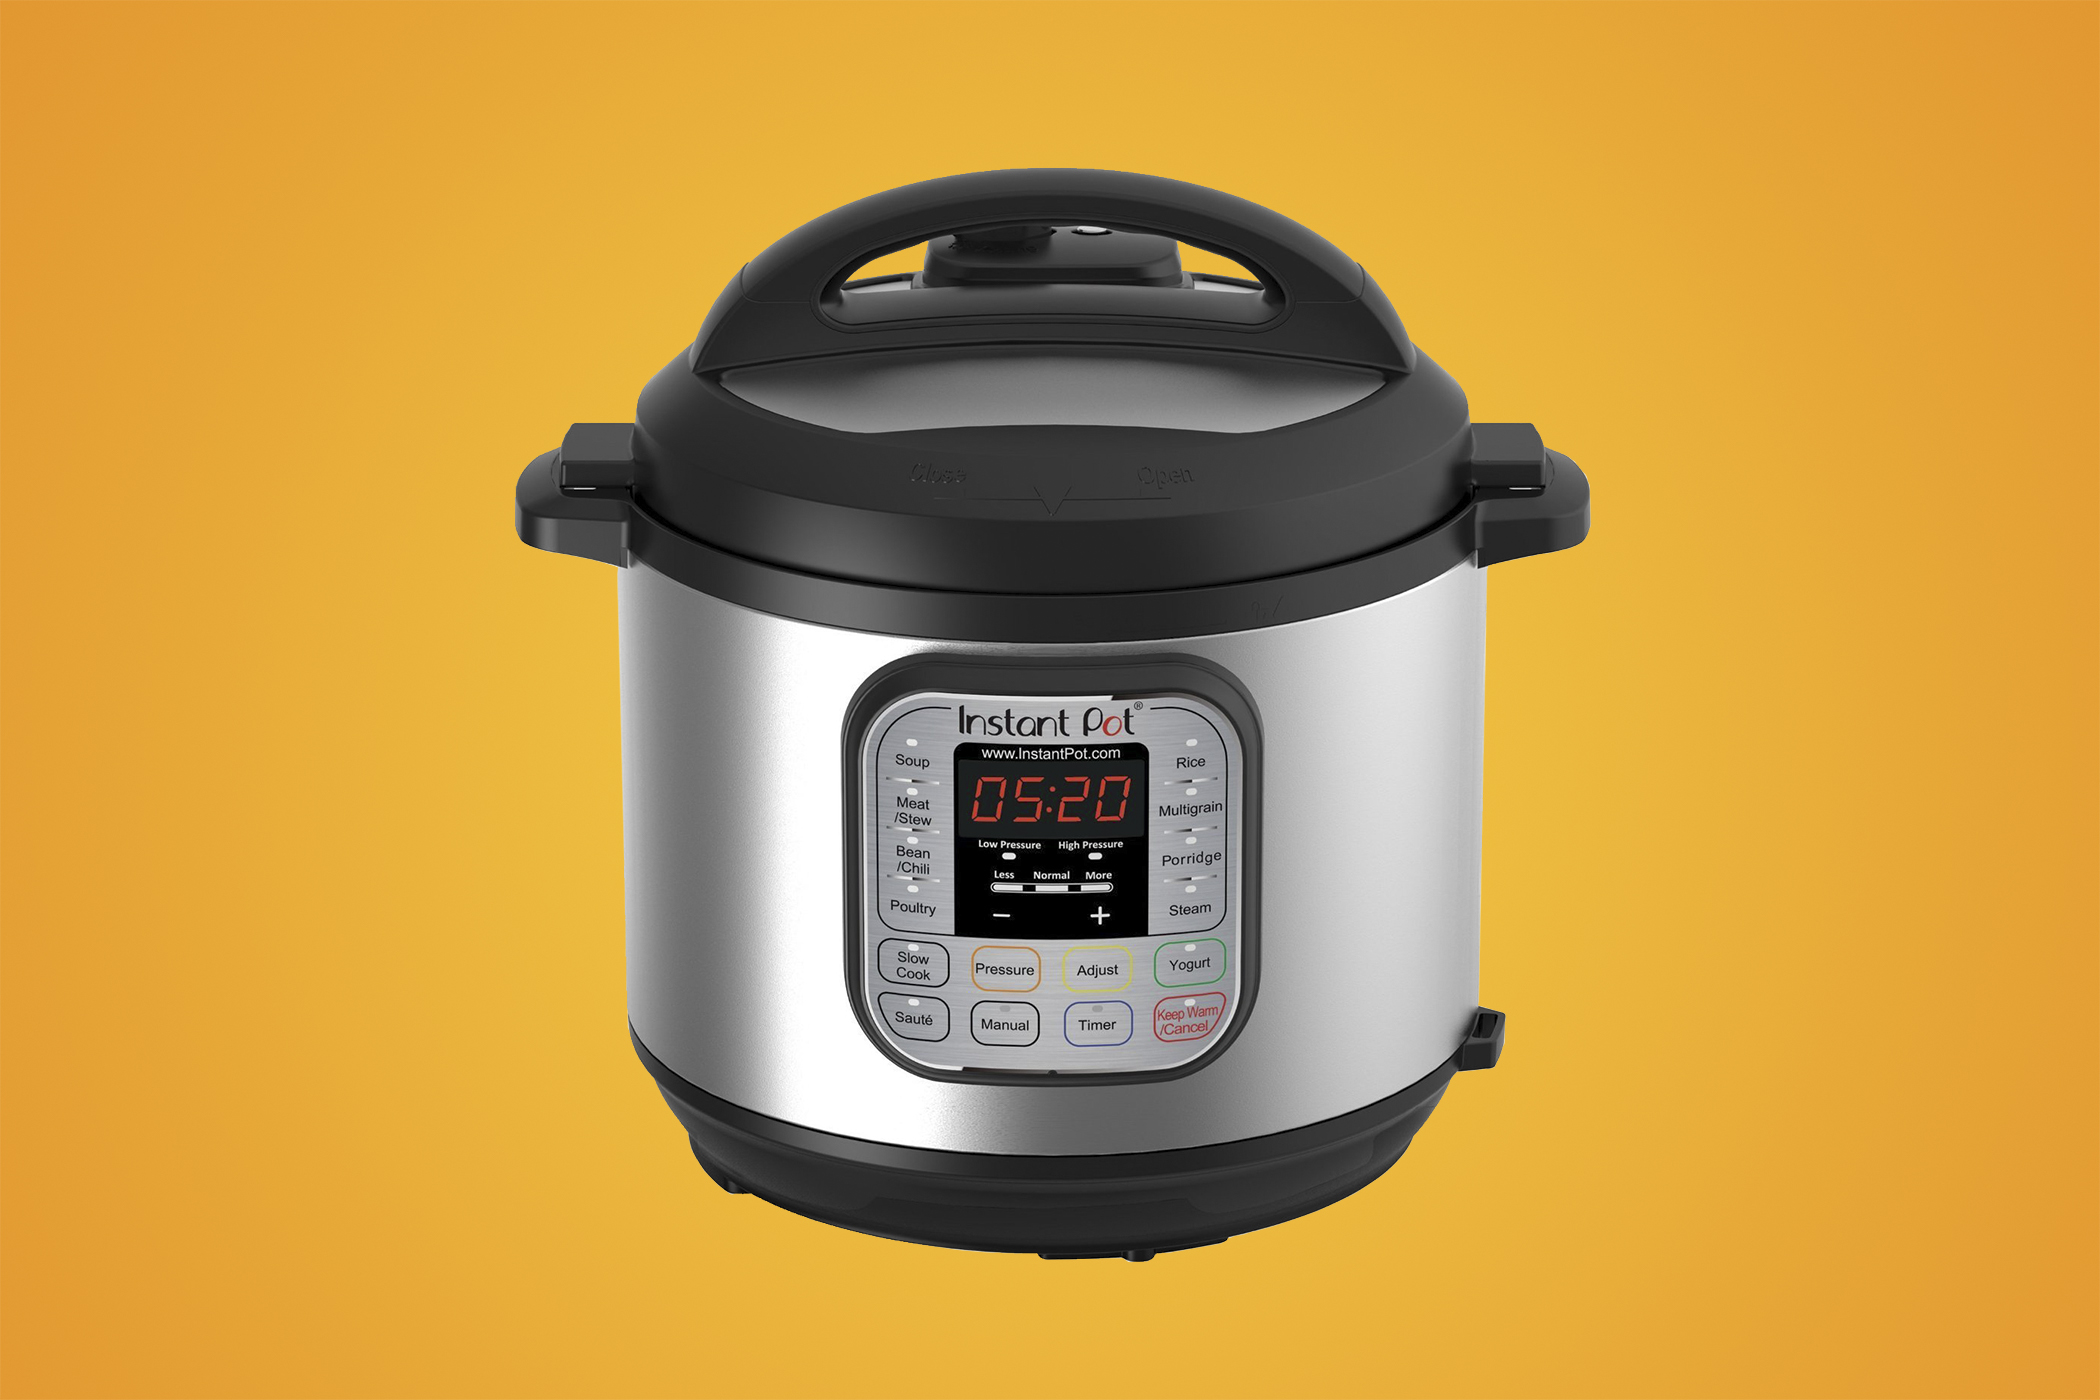 170331-instant-pot-pressure-cooker